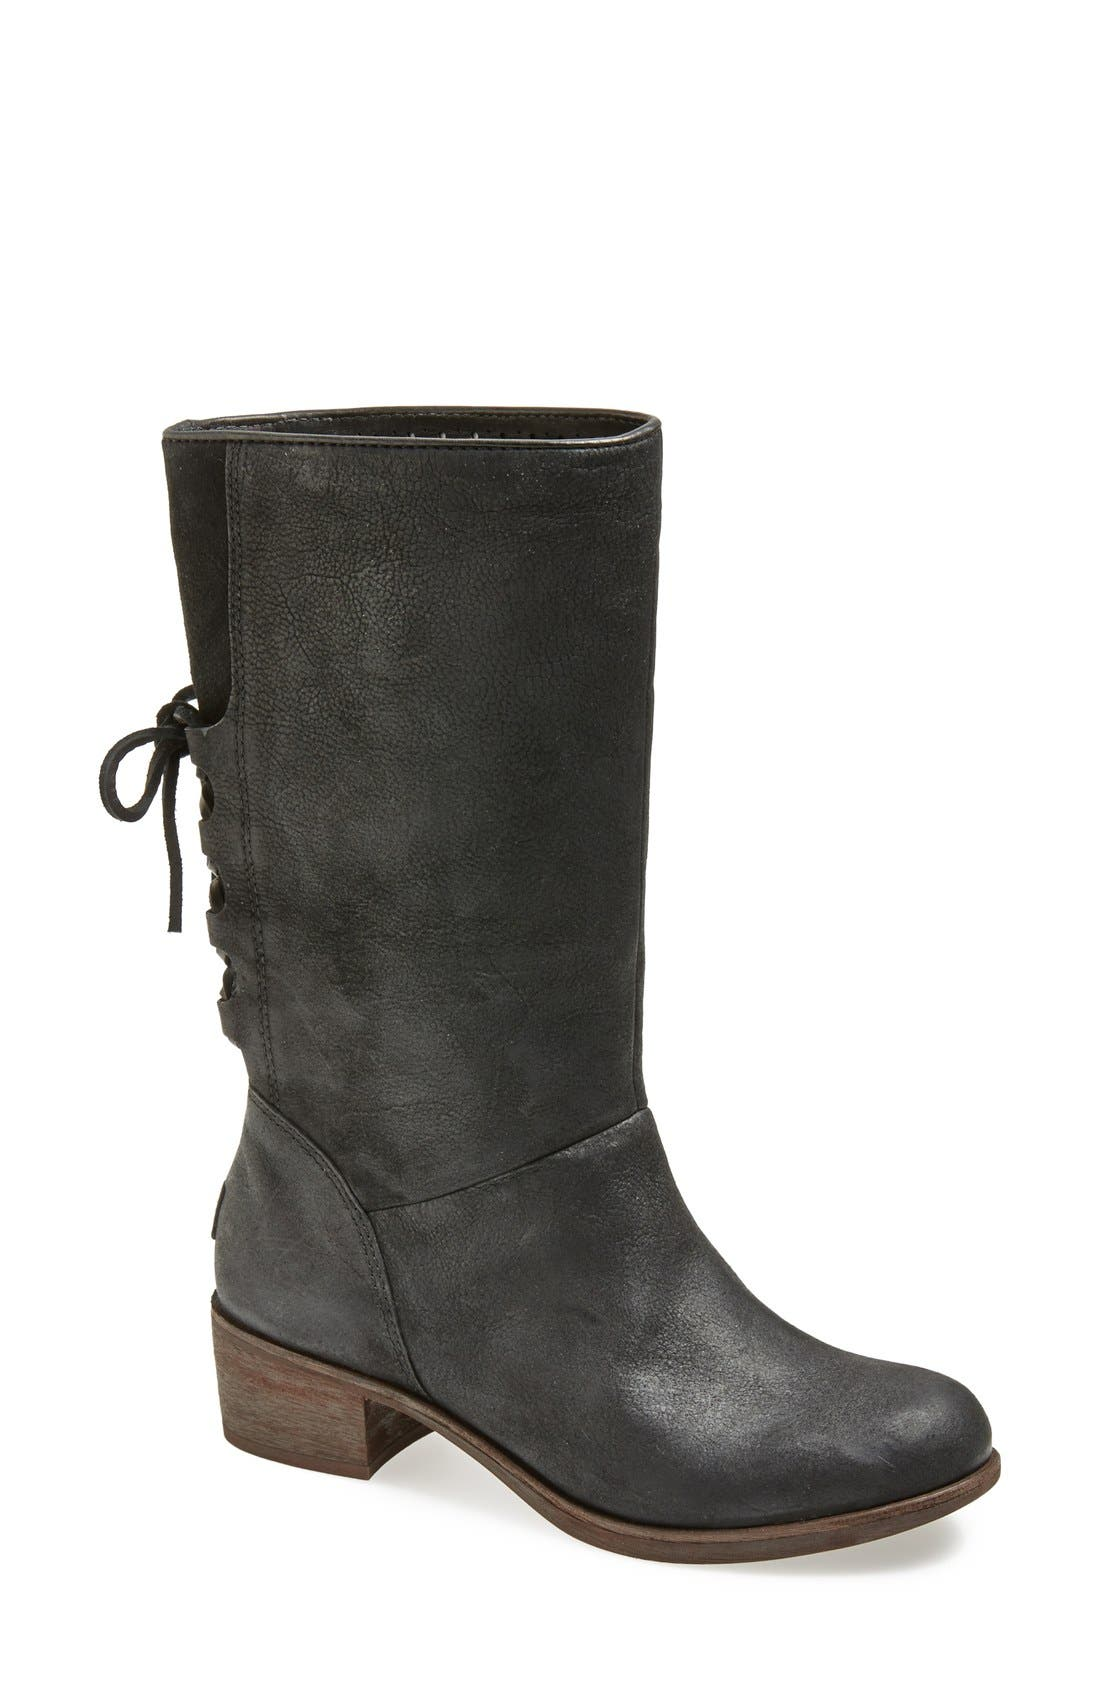 Main Image - UGG® Australia 'Cary' Boot (Women)